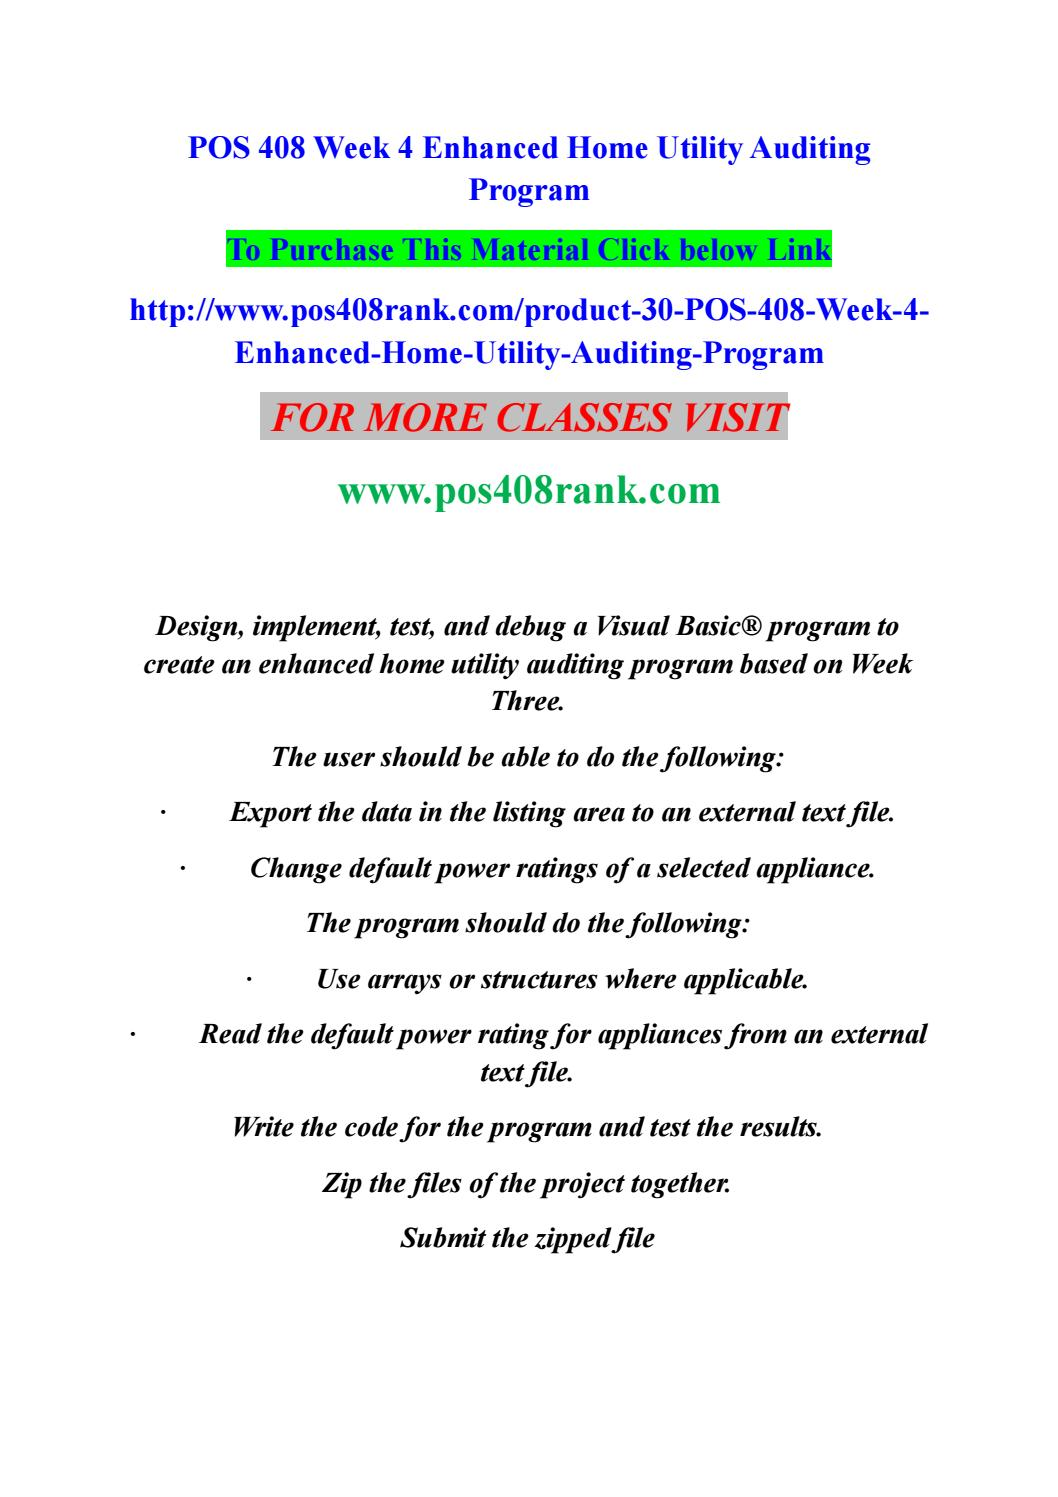 Pos 408 week 4 enhanced home utility auditing program by David2b - issuu